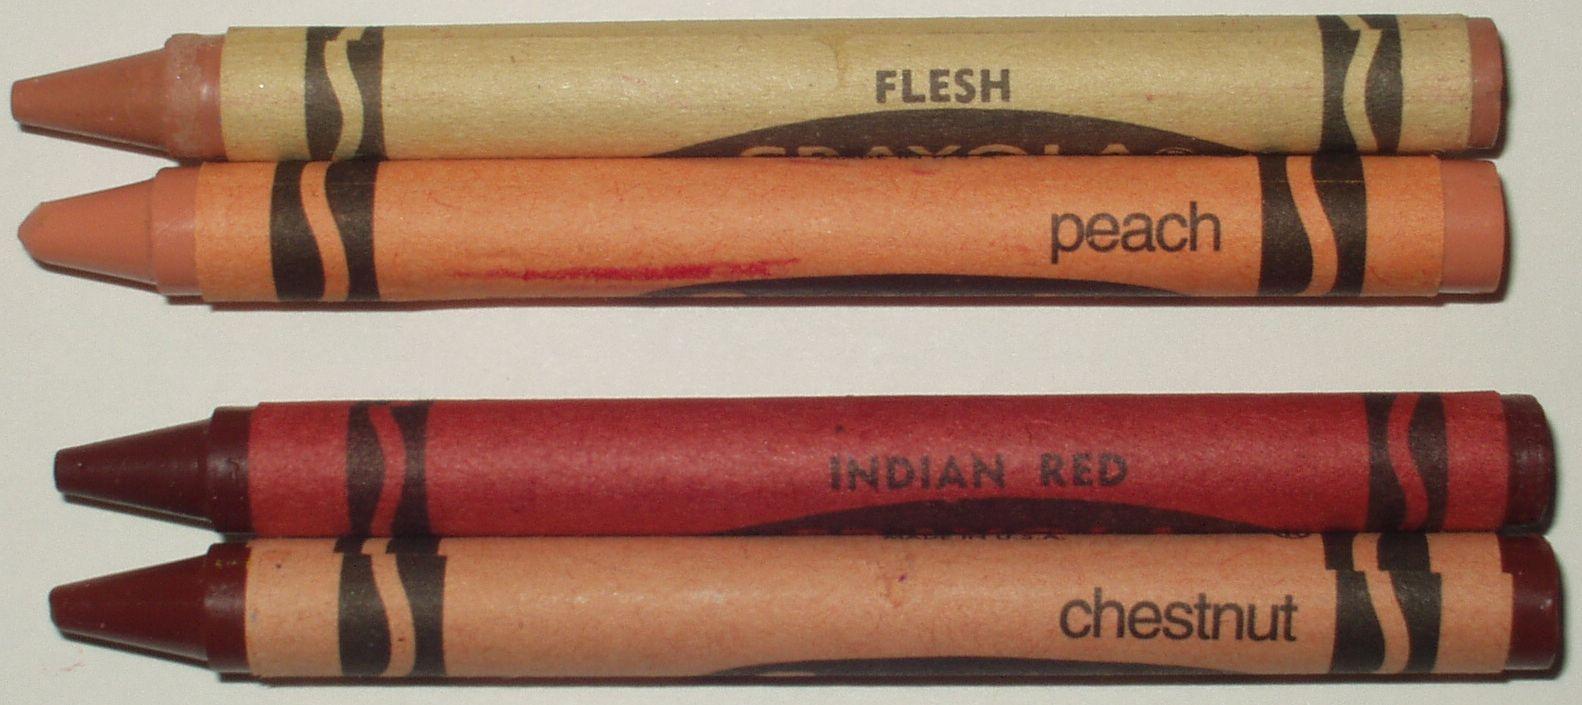 Crayola crayon names